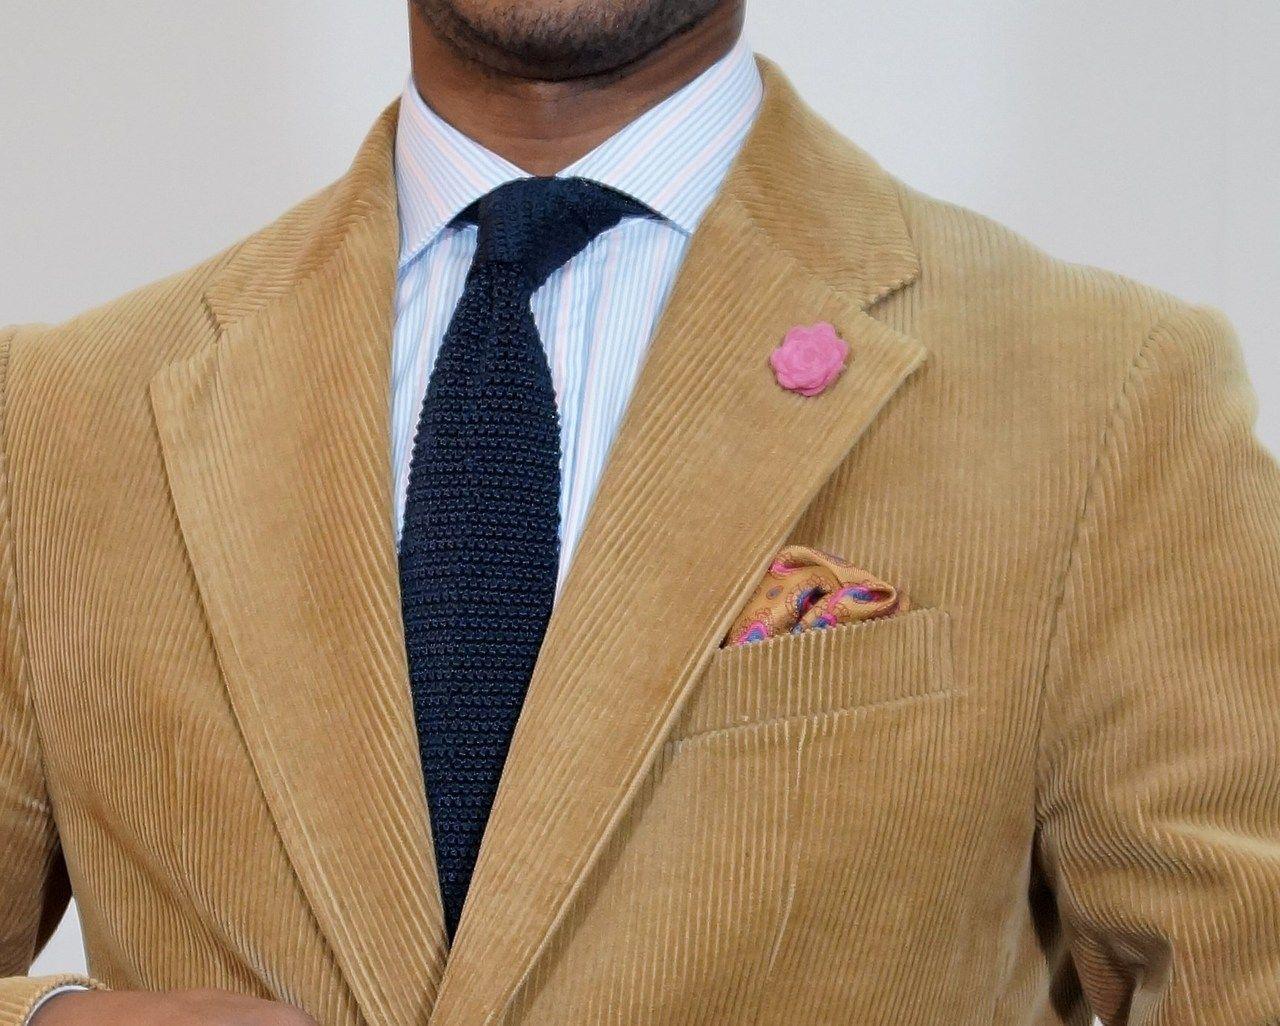 Tan corduroy jacket, light blue shirt with pink & white ...